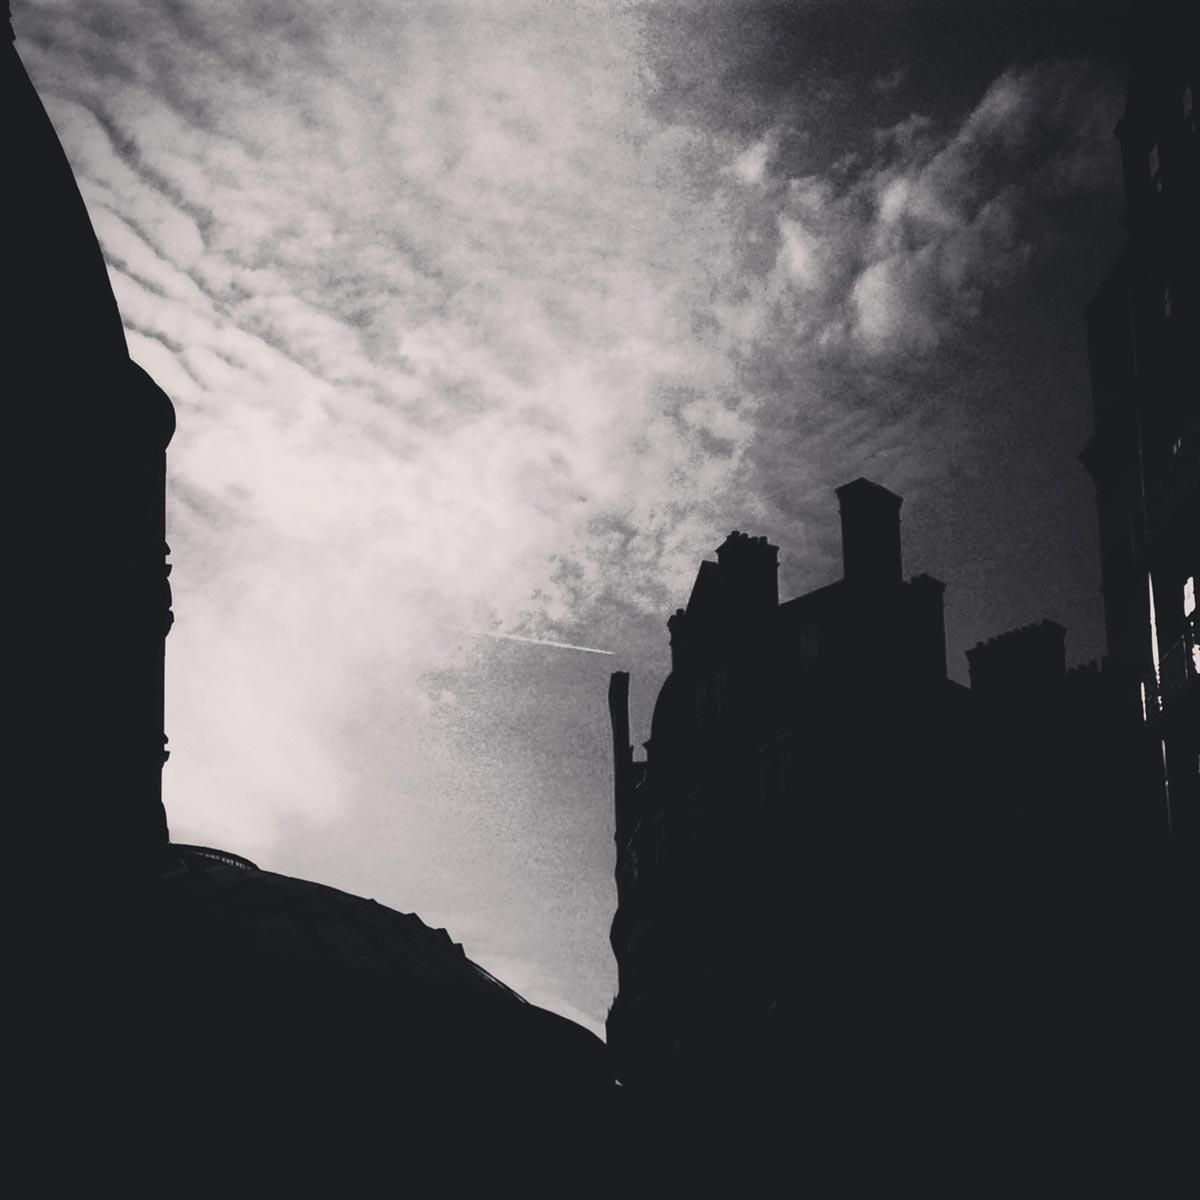 Royal Albert Hall silhouette, London